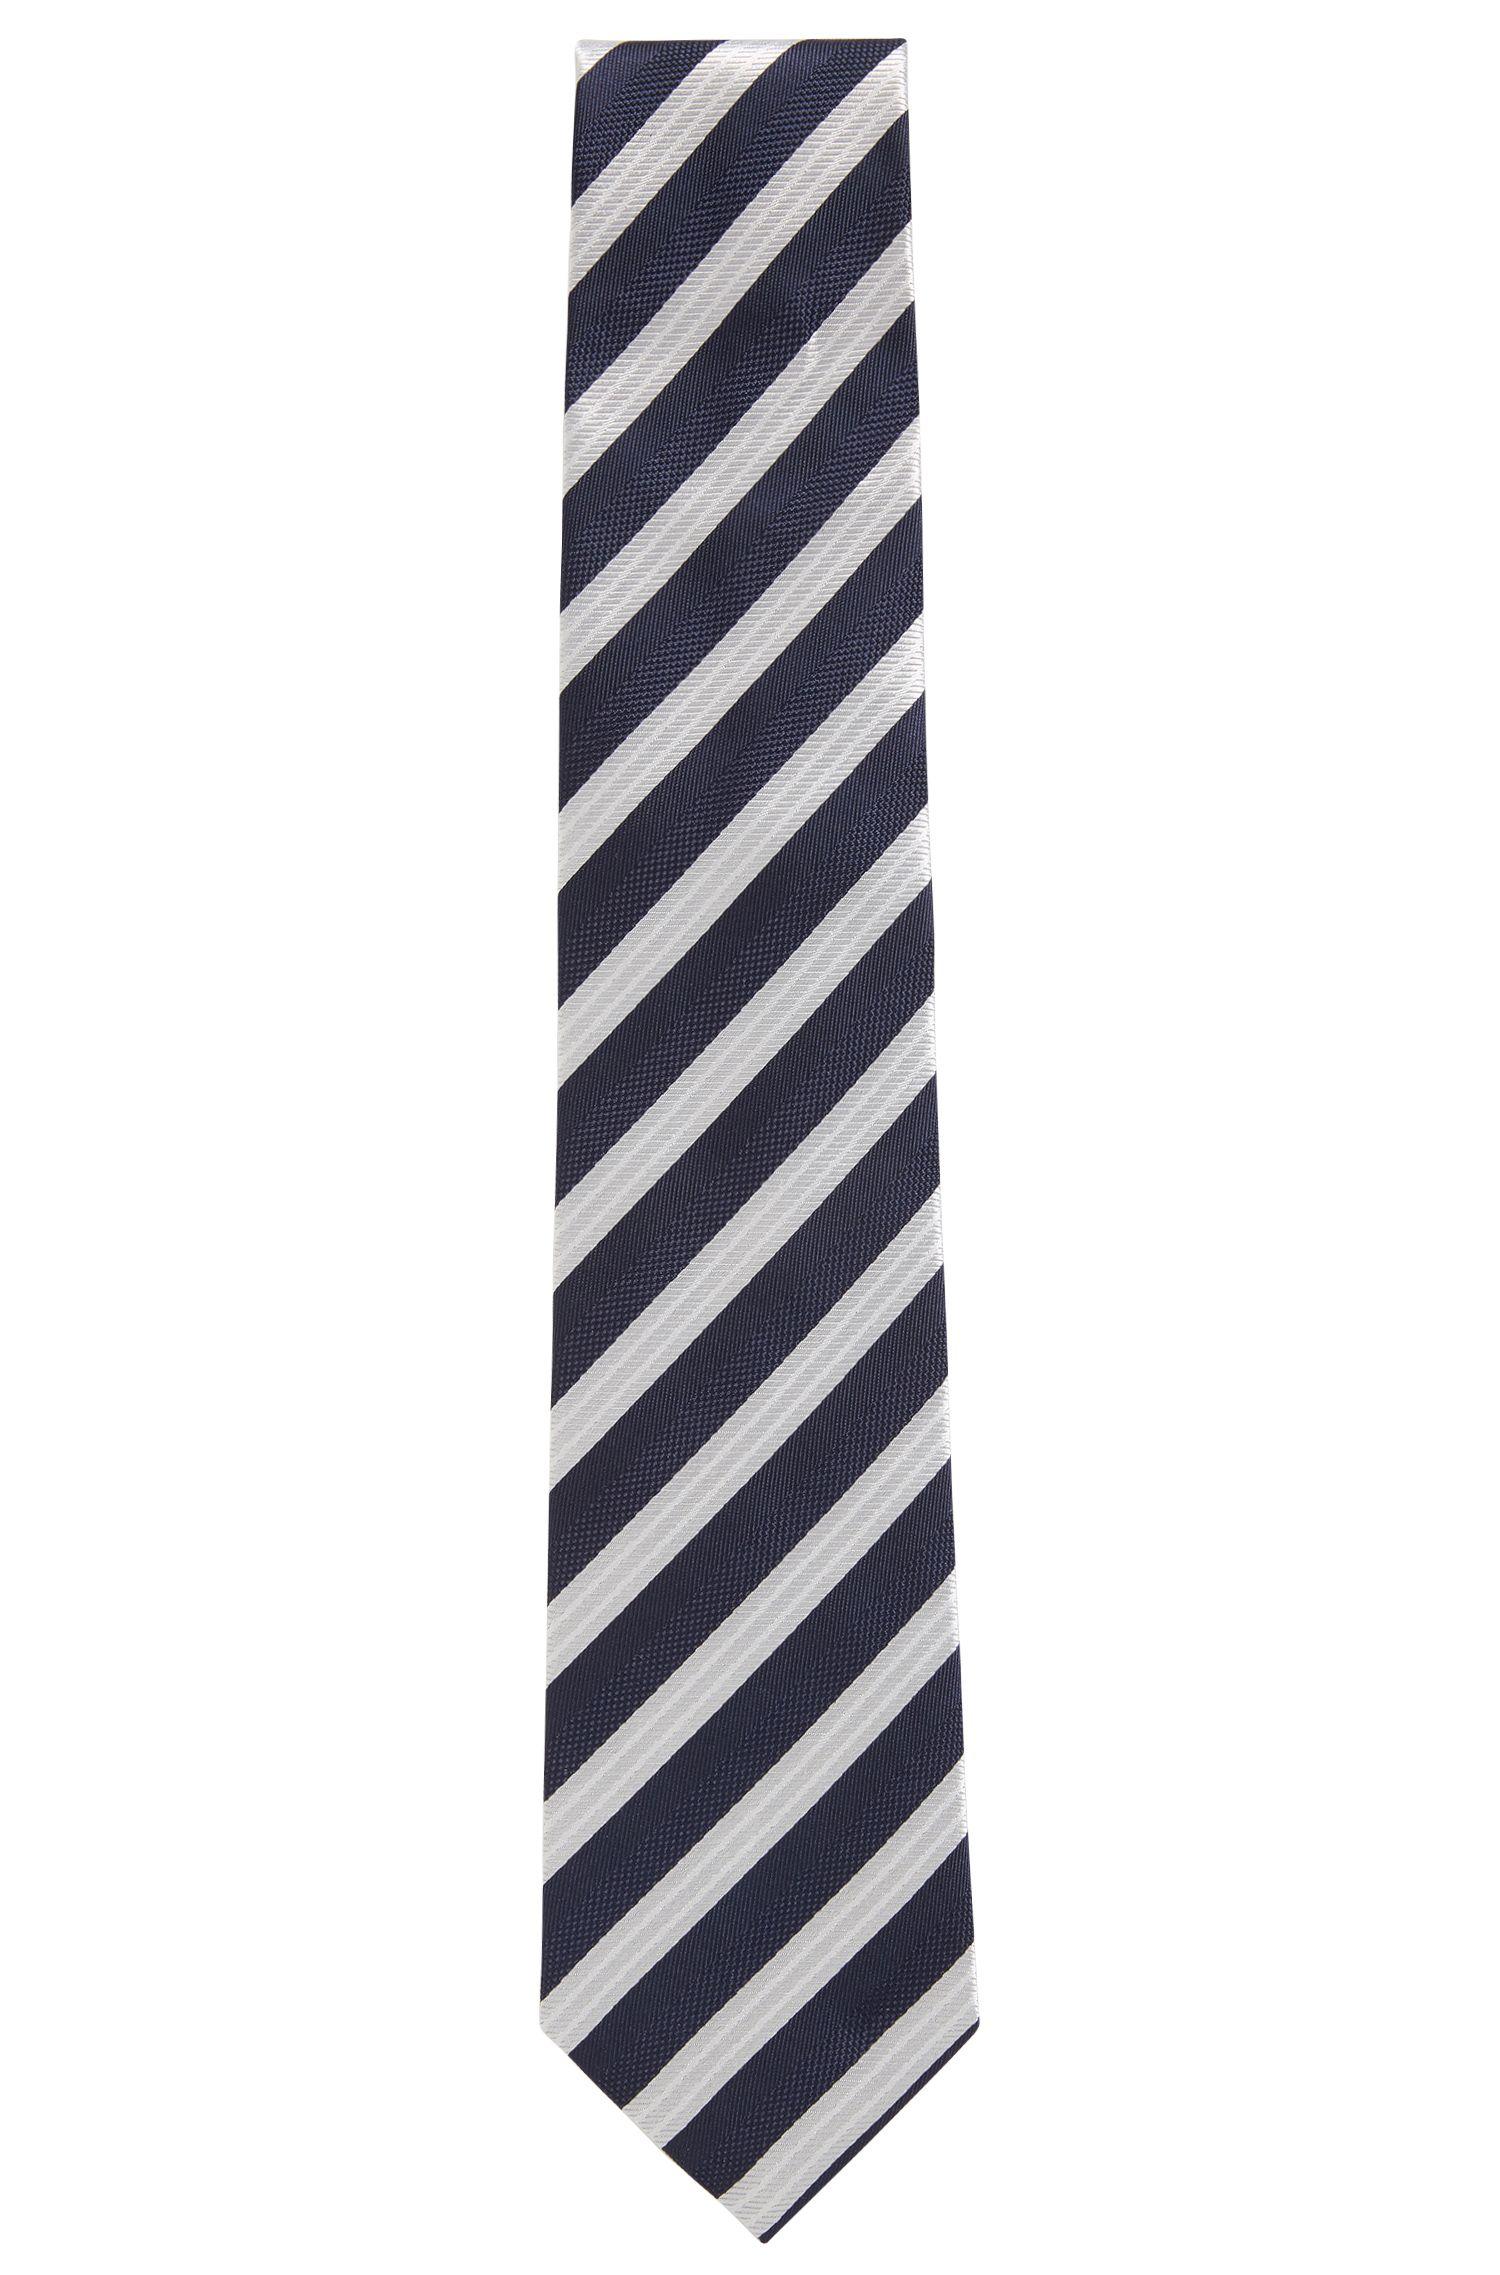 Cravatta in seta jacquard a righe diagonali